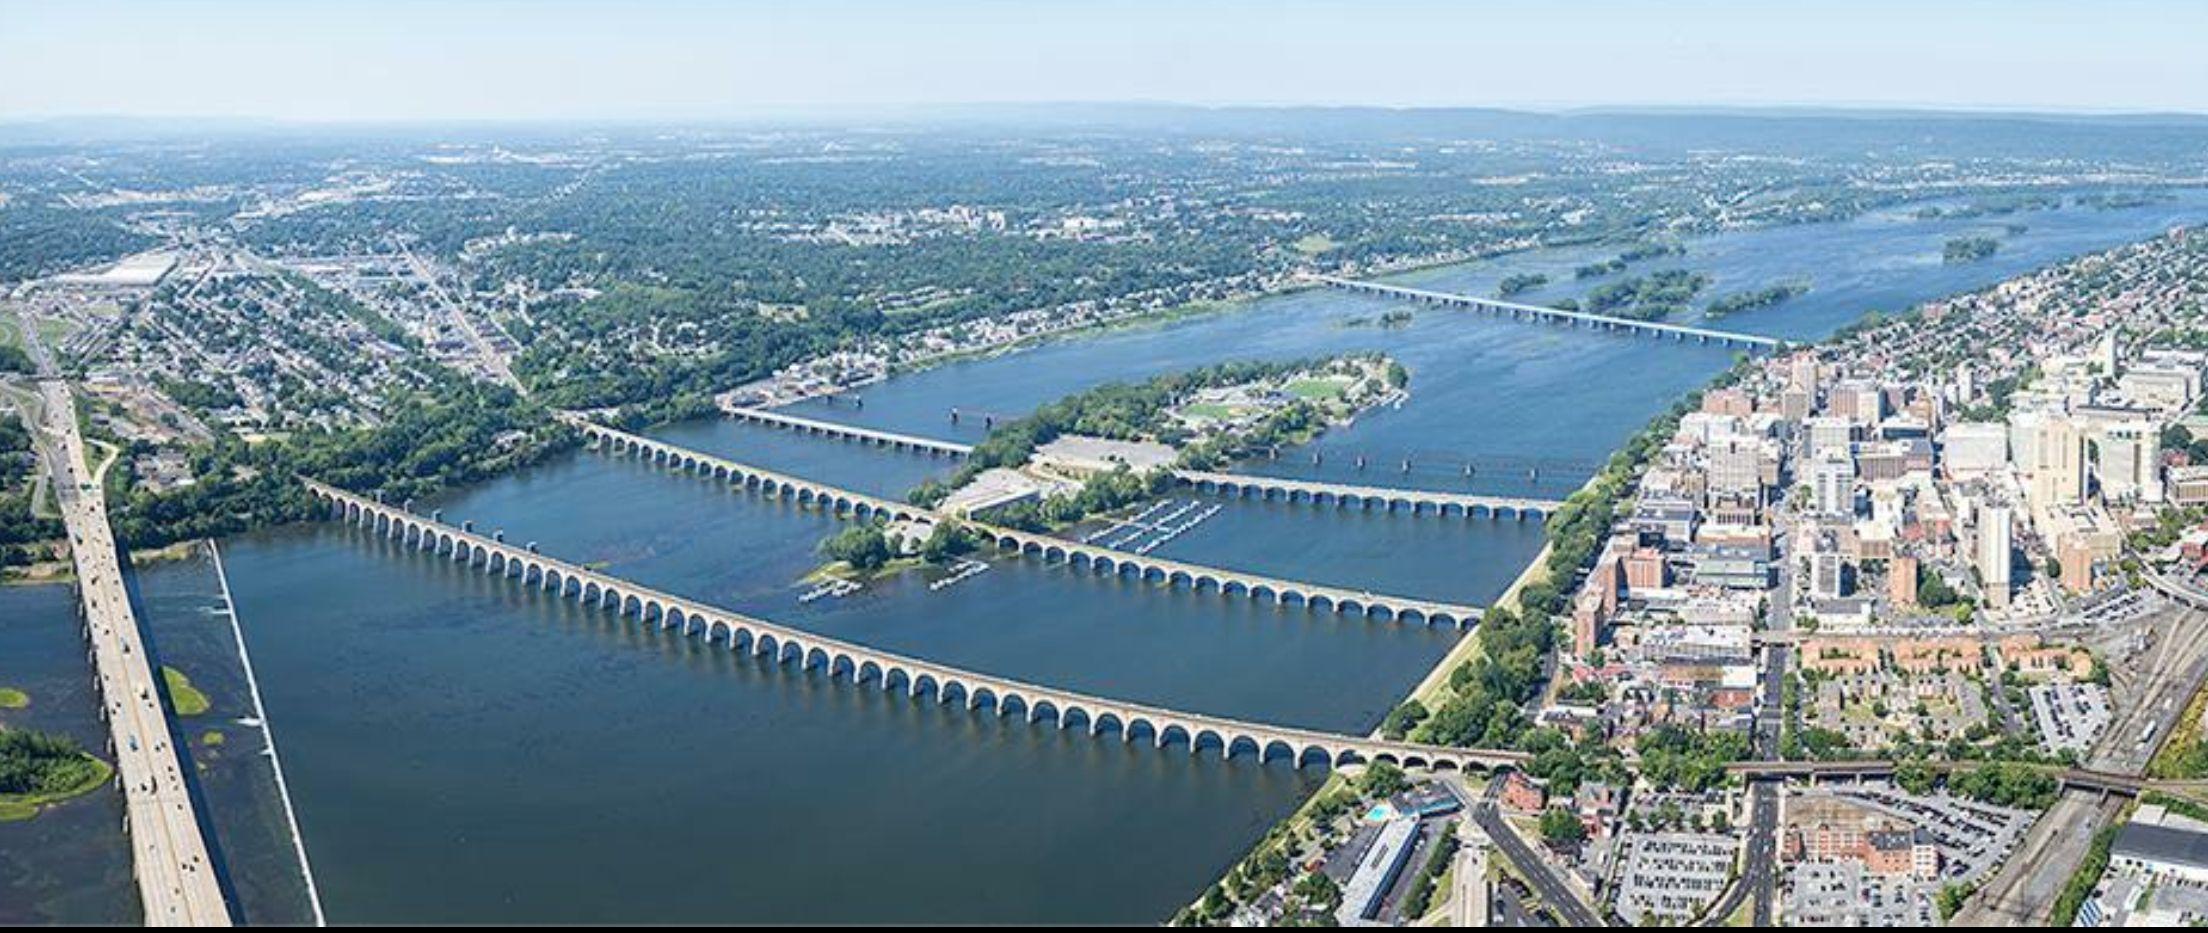 Harrisburg pa aerial view aerial view favorite places